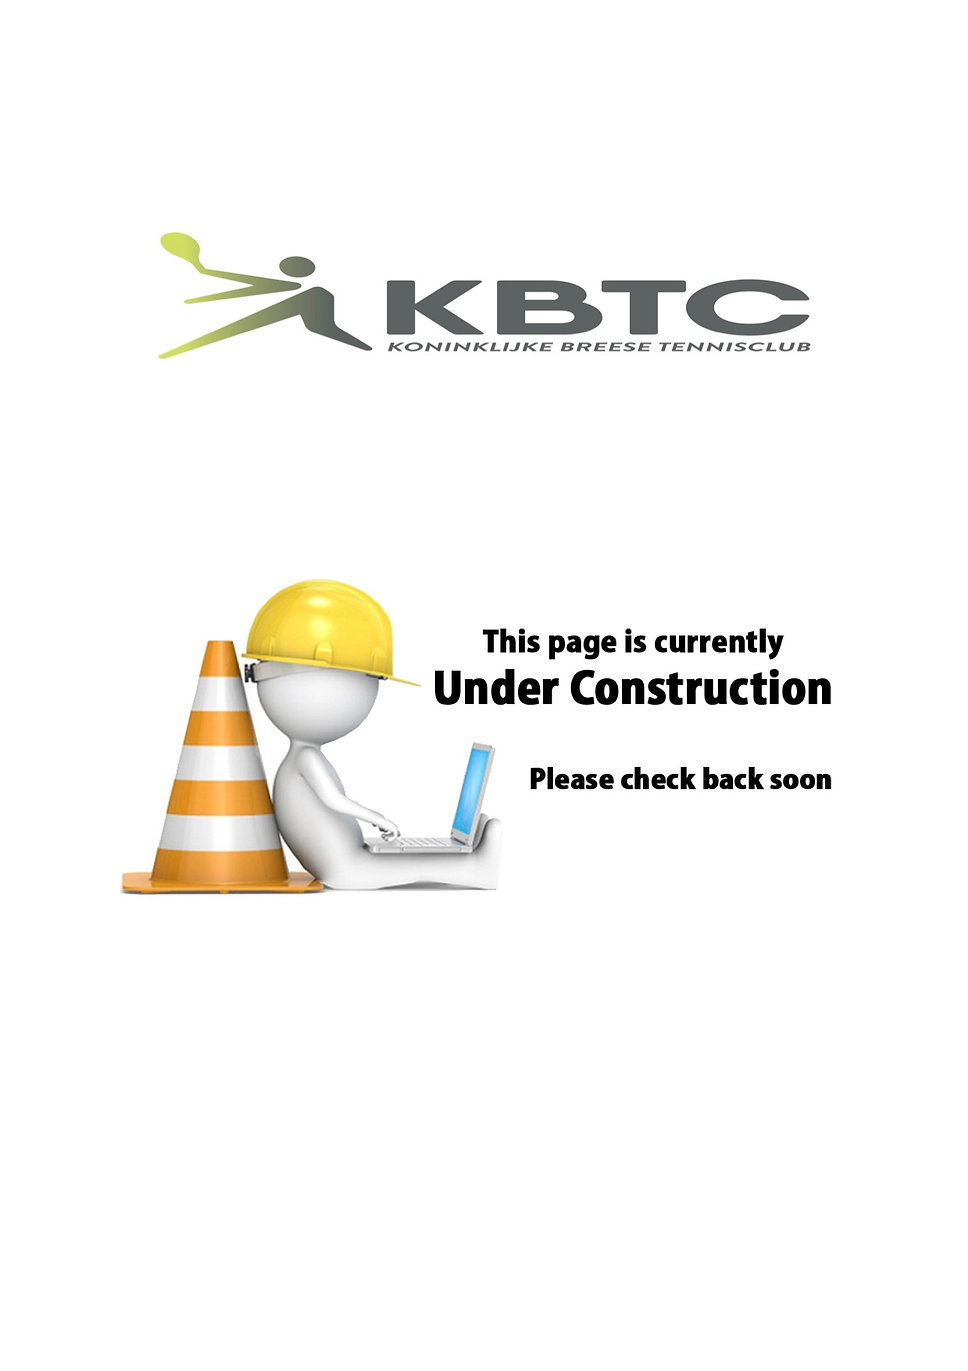 kbtc under construction jpeg.jpg